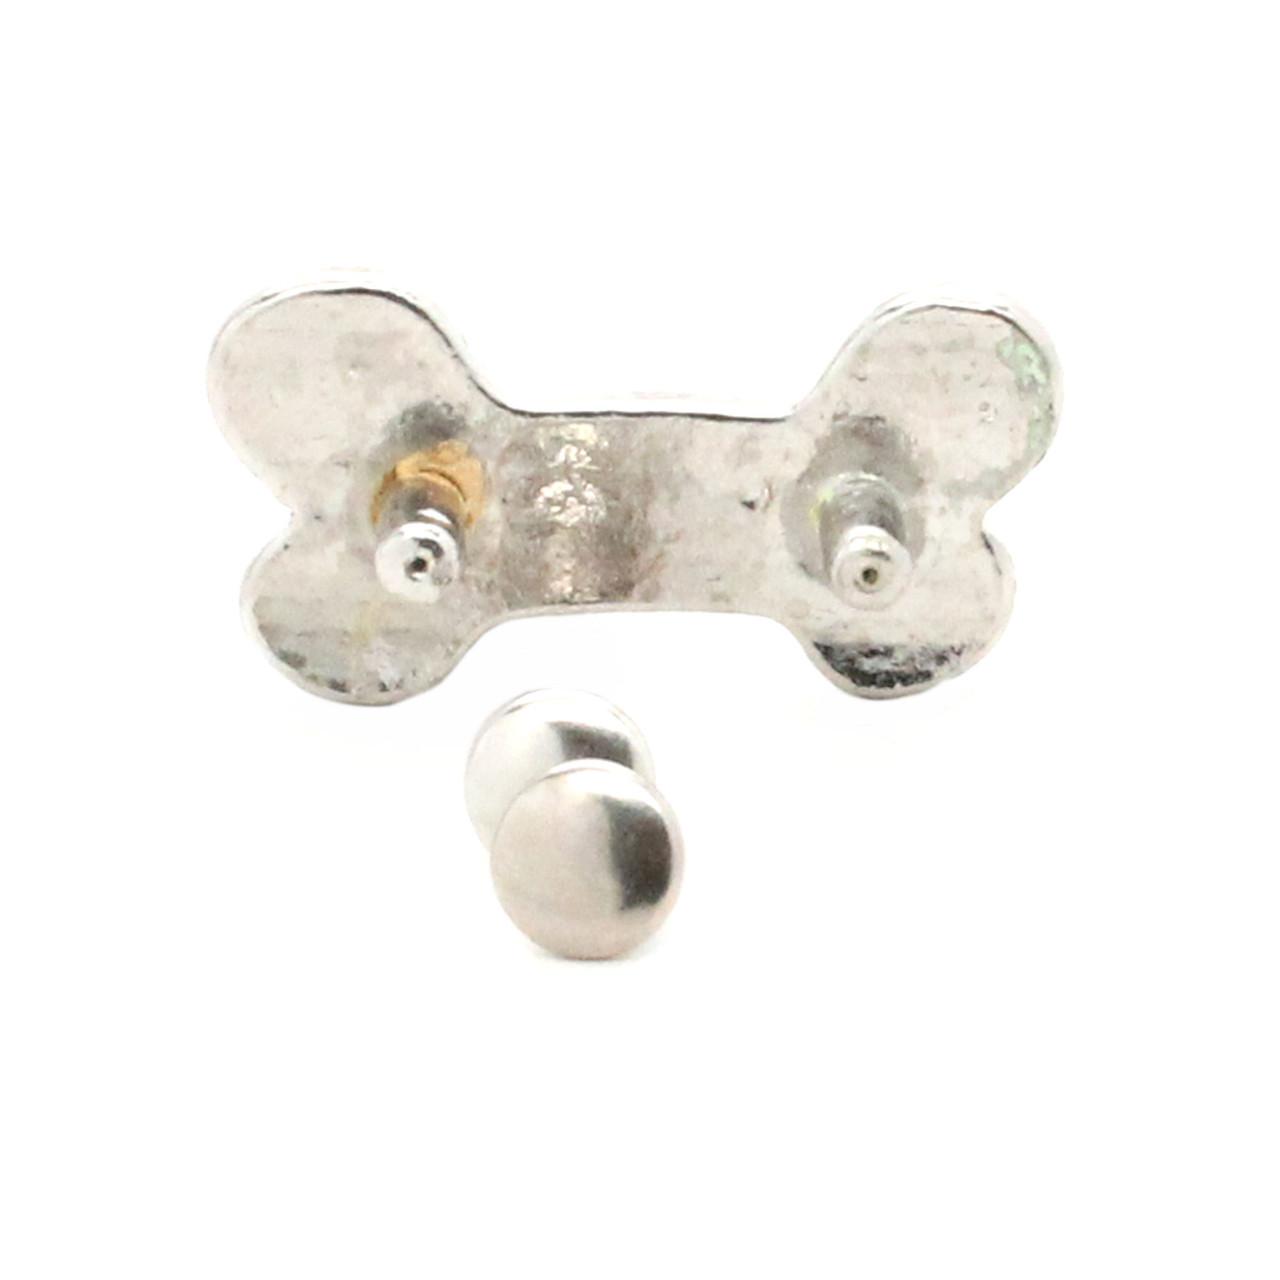 "Dog Bone Concho Shiny Nickel Rivet Back 1"" Back"